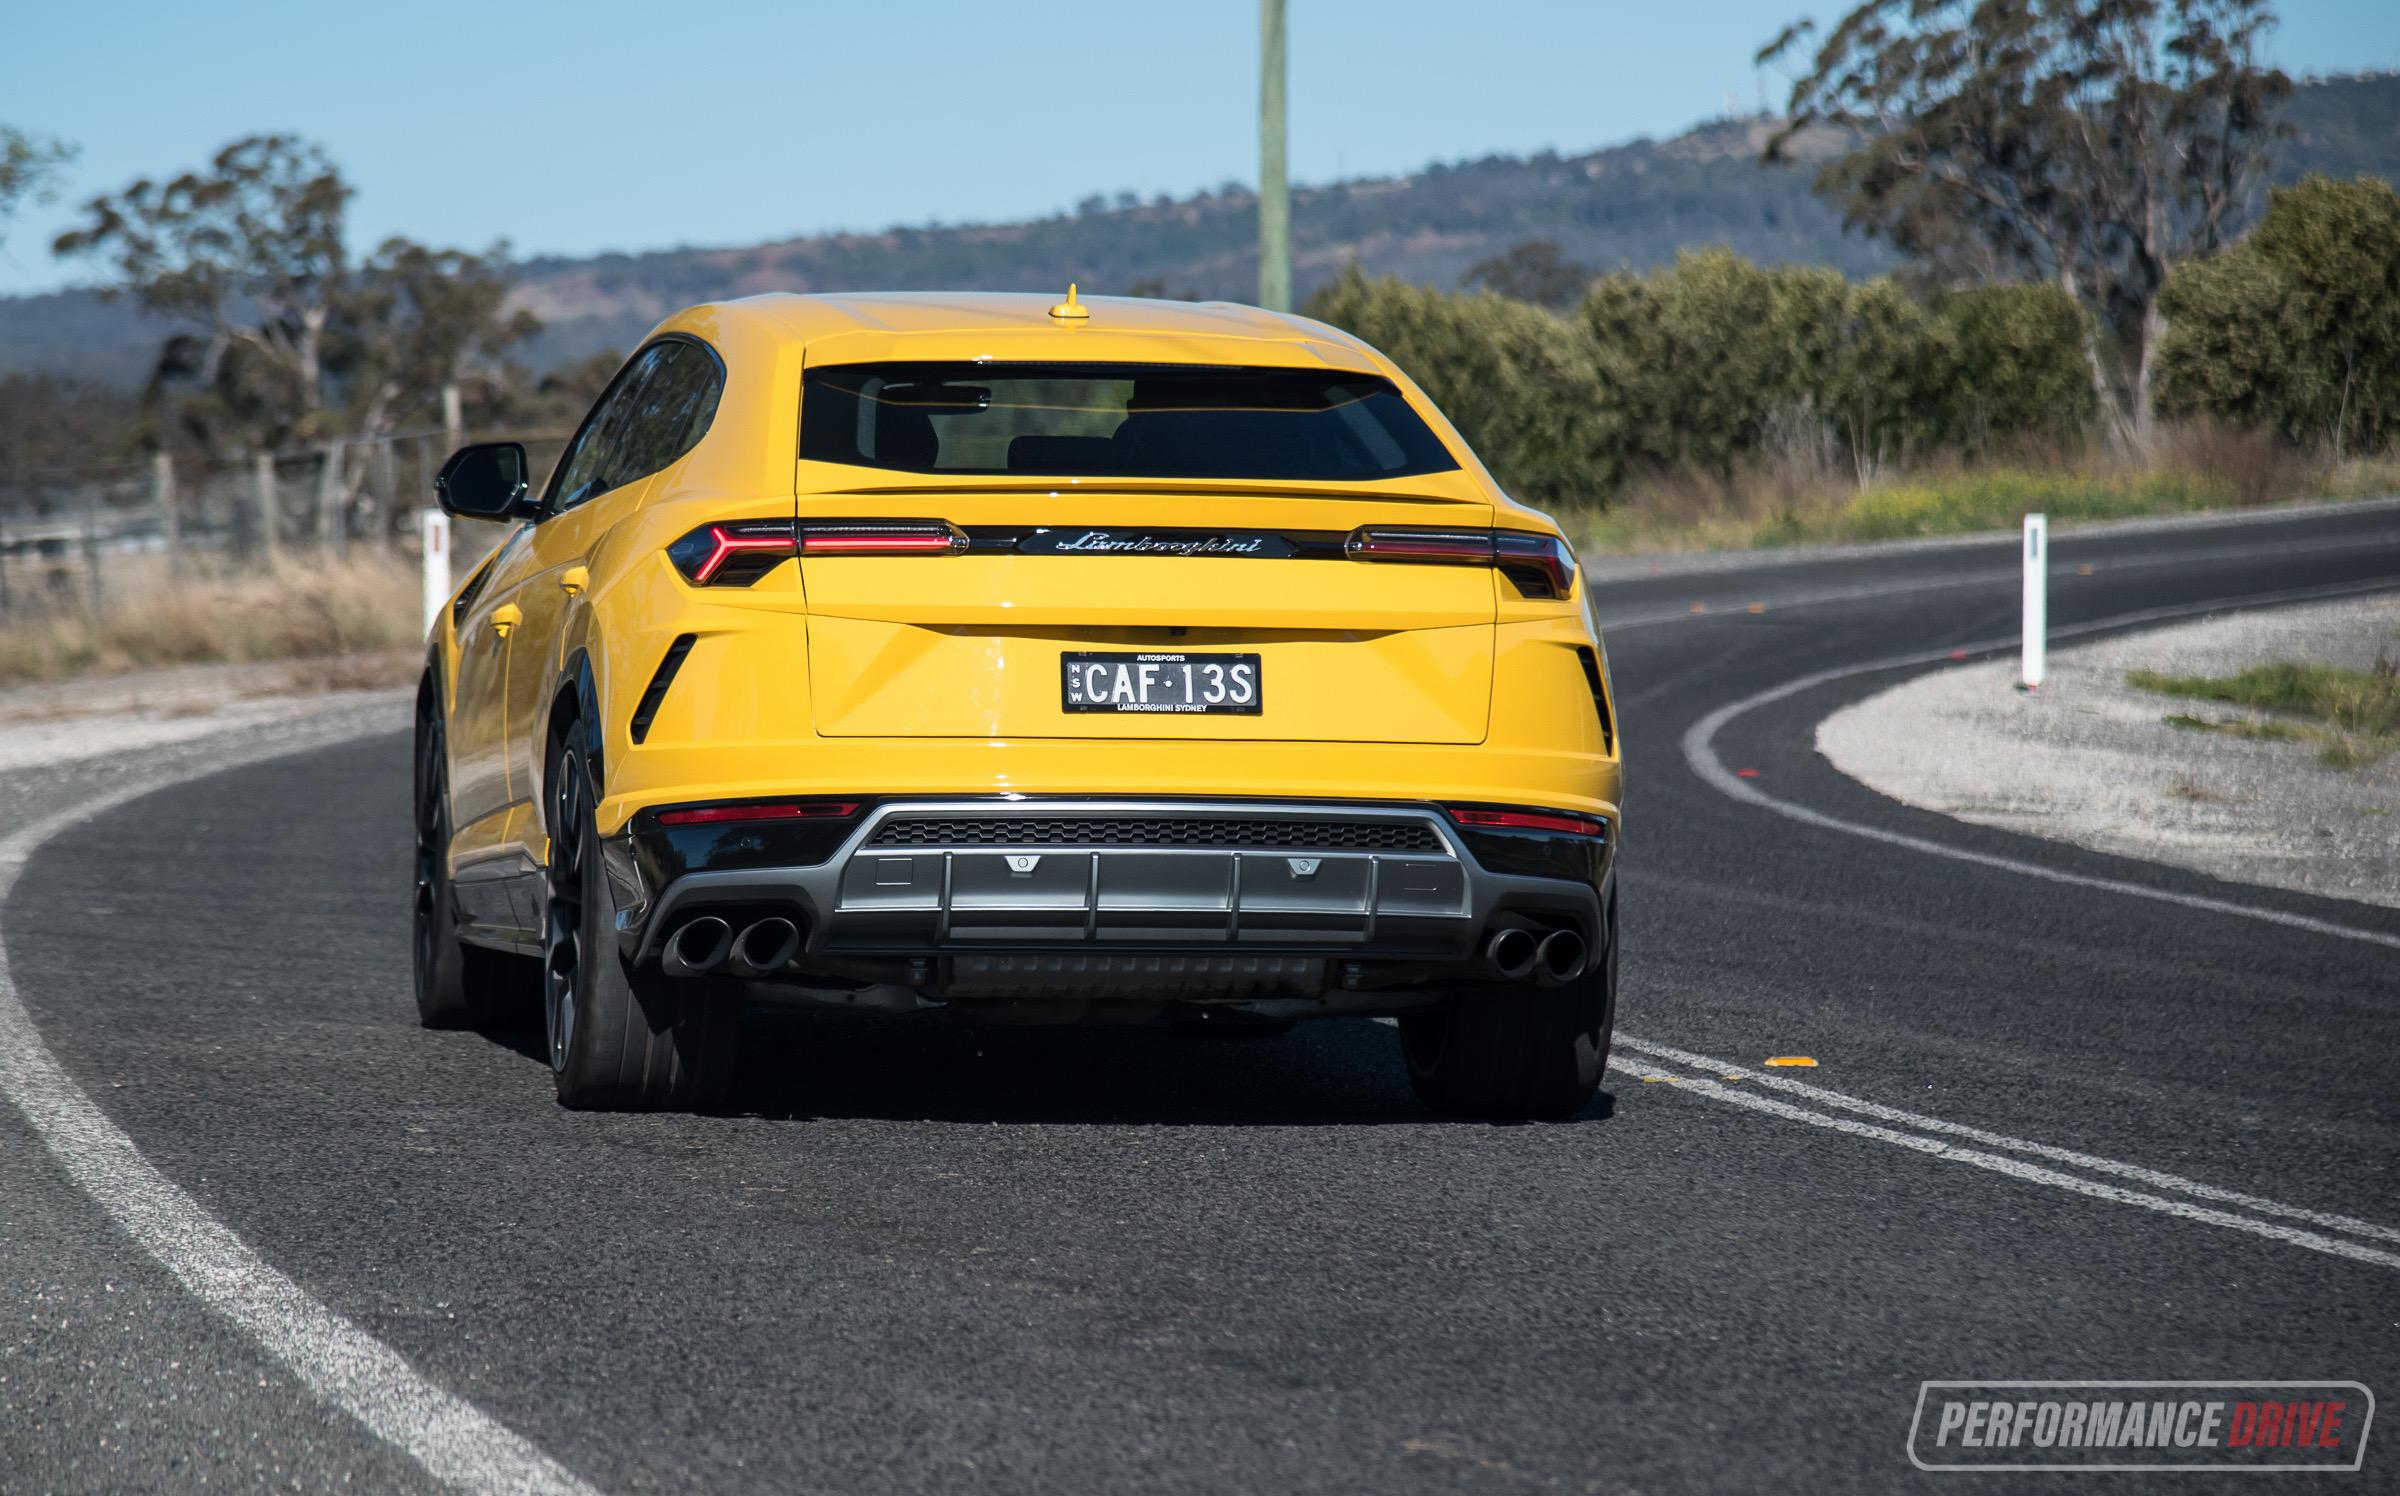 2019 Lamborghini Urus review (video) | PerformanceDrive